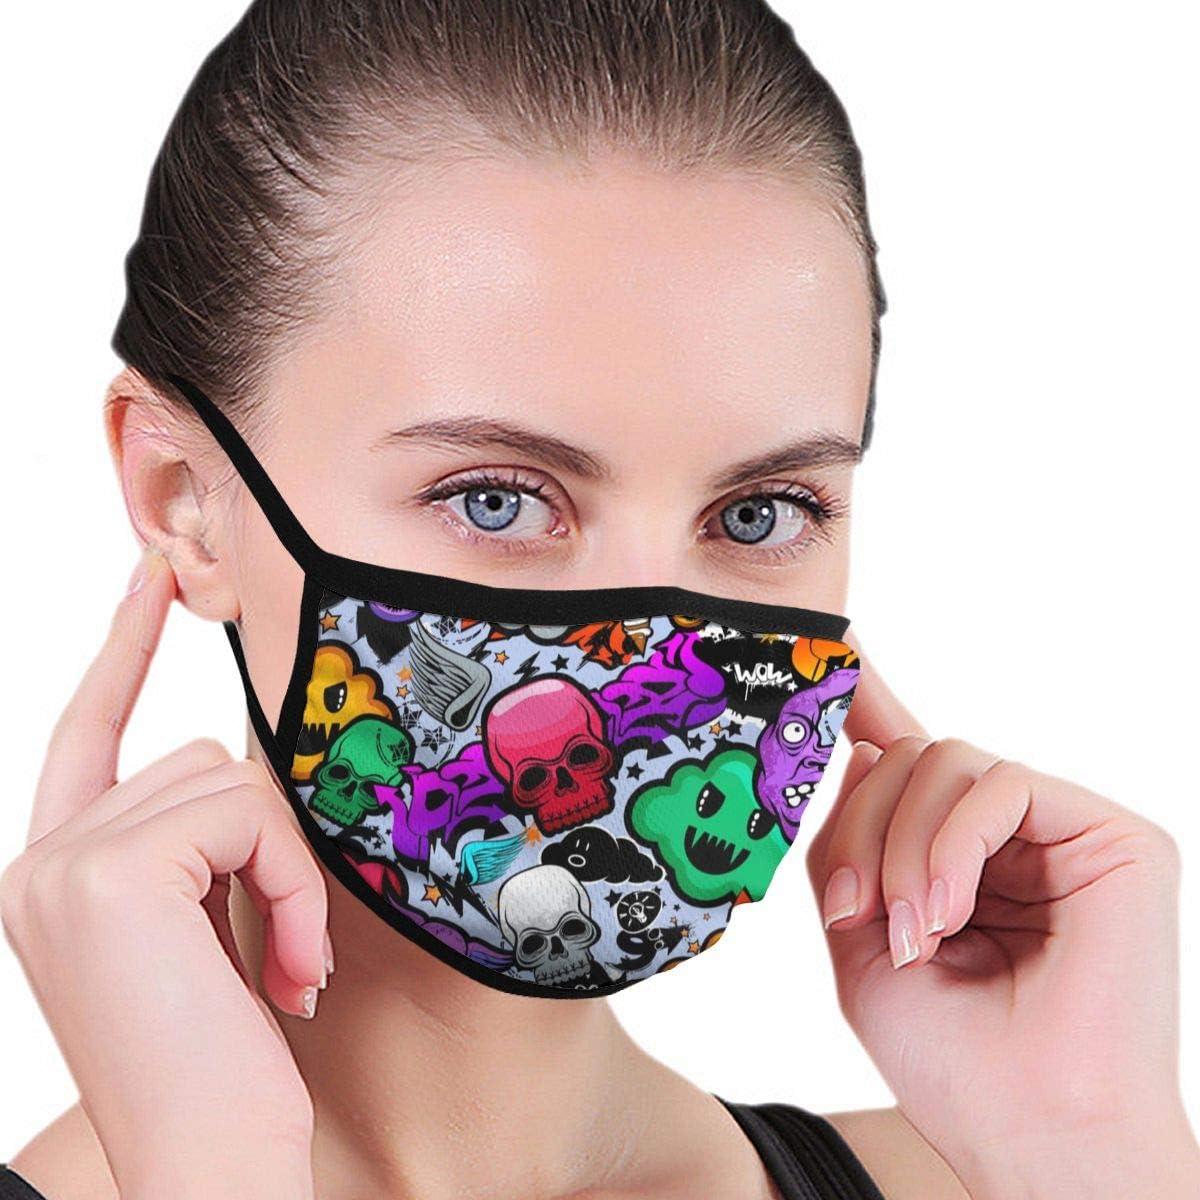 Ladion Hexagon PatternMen's Women's Print Warm Washable Reusable Ear Warmer Neck Warmer Construction Mouth Wear